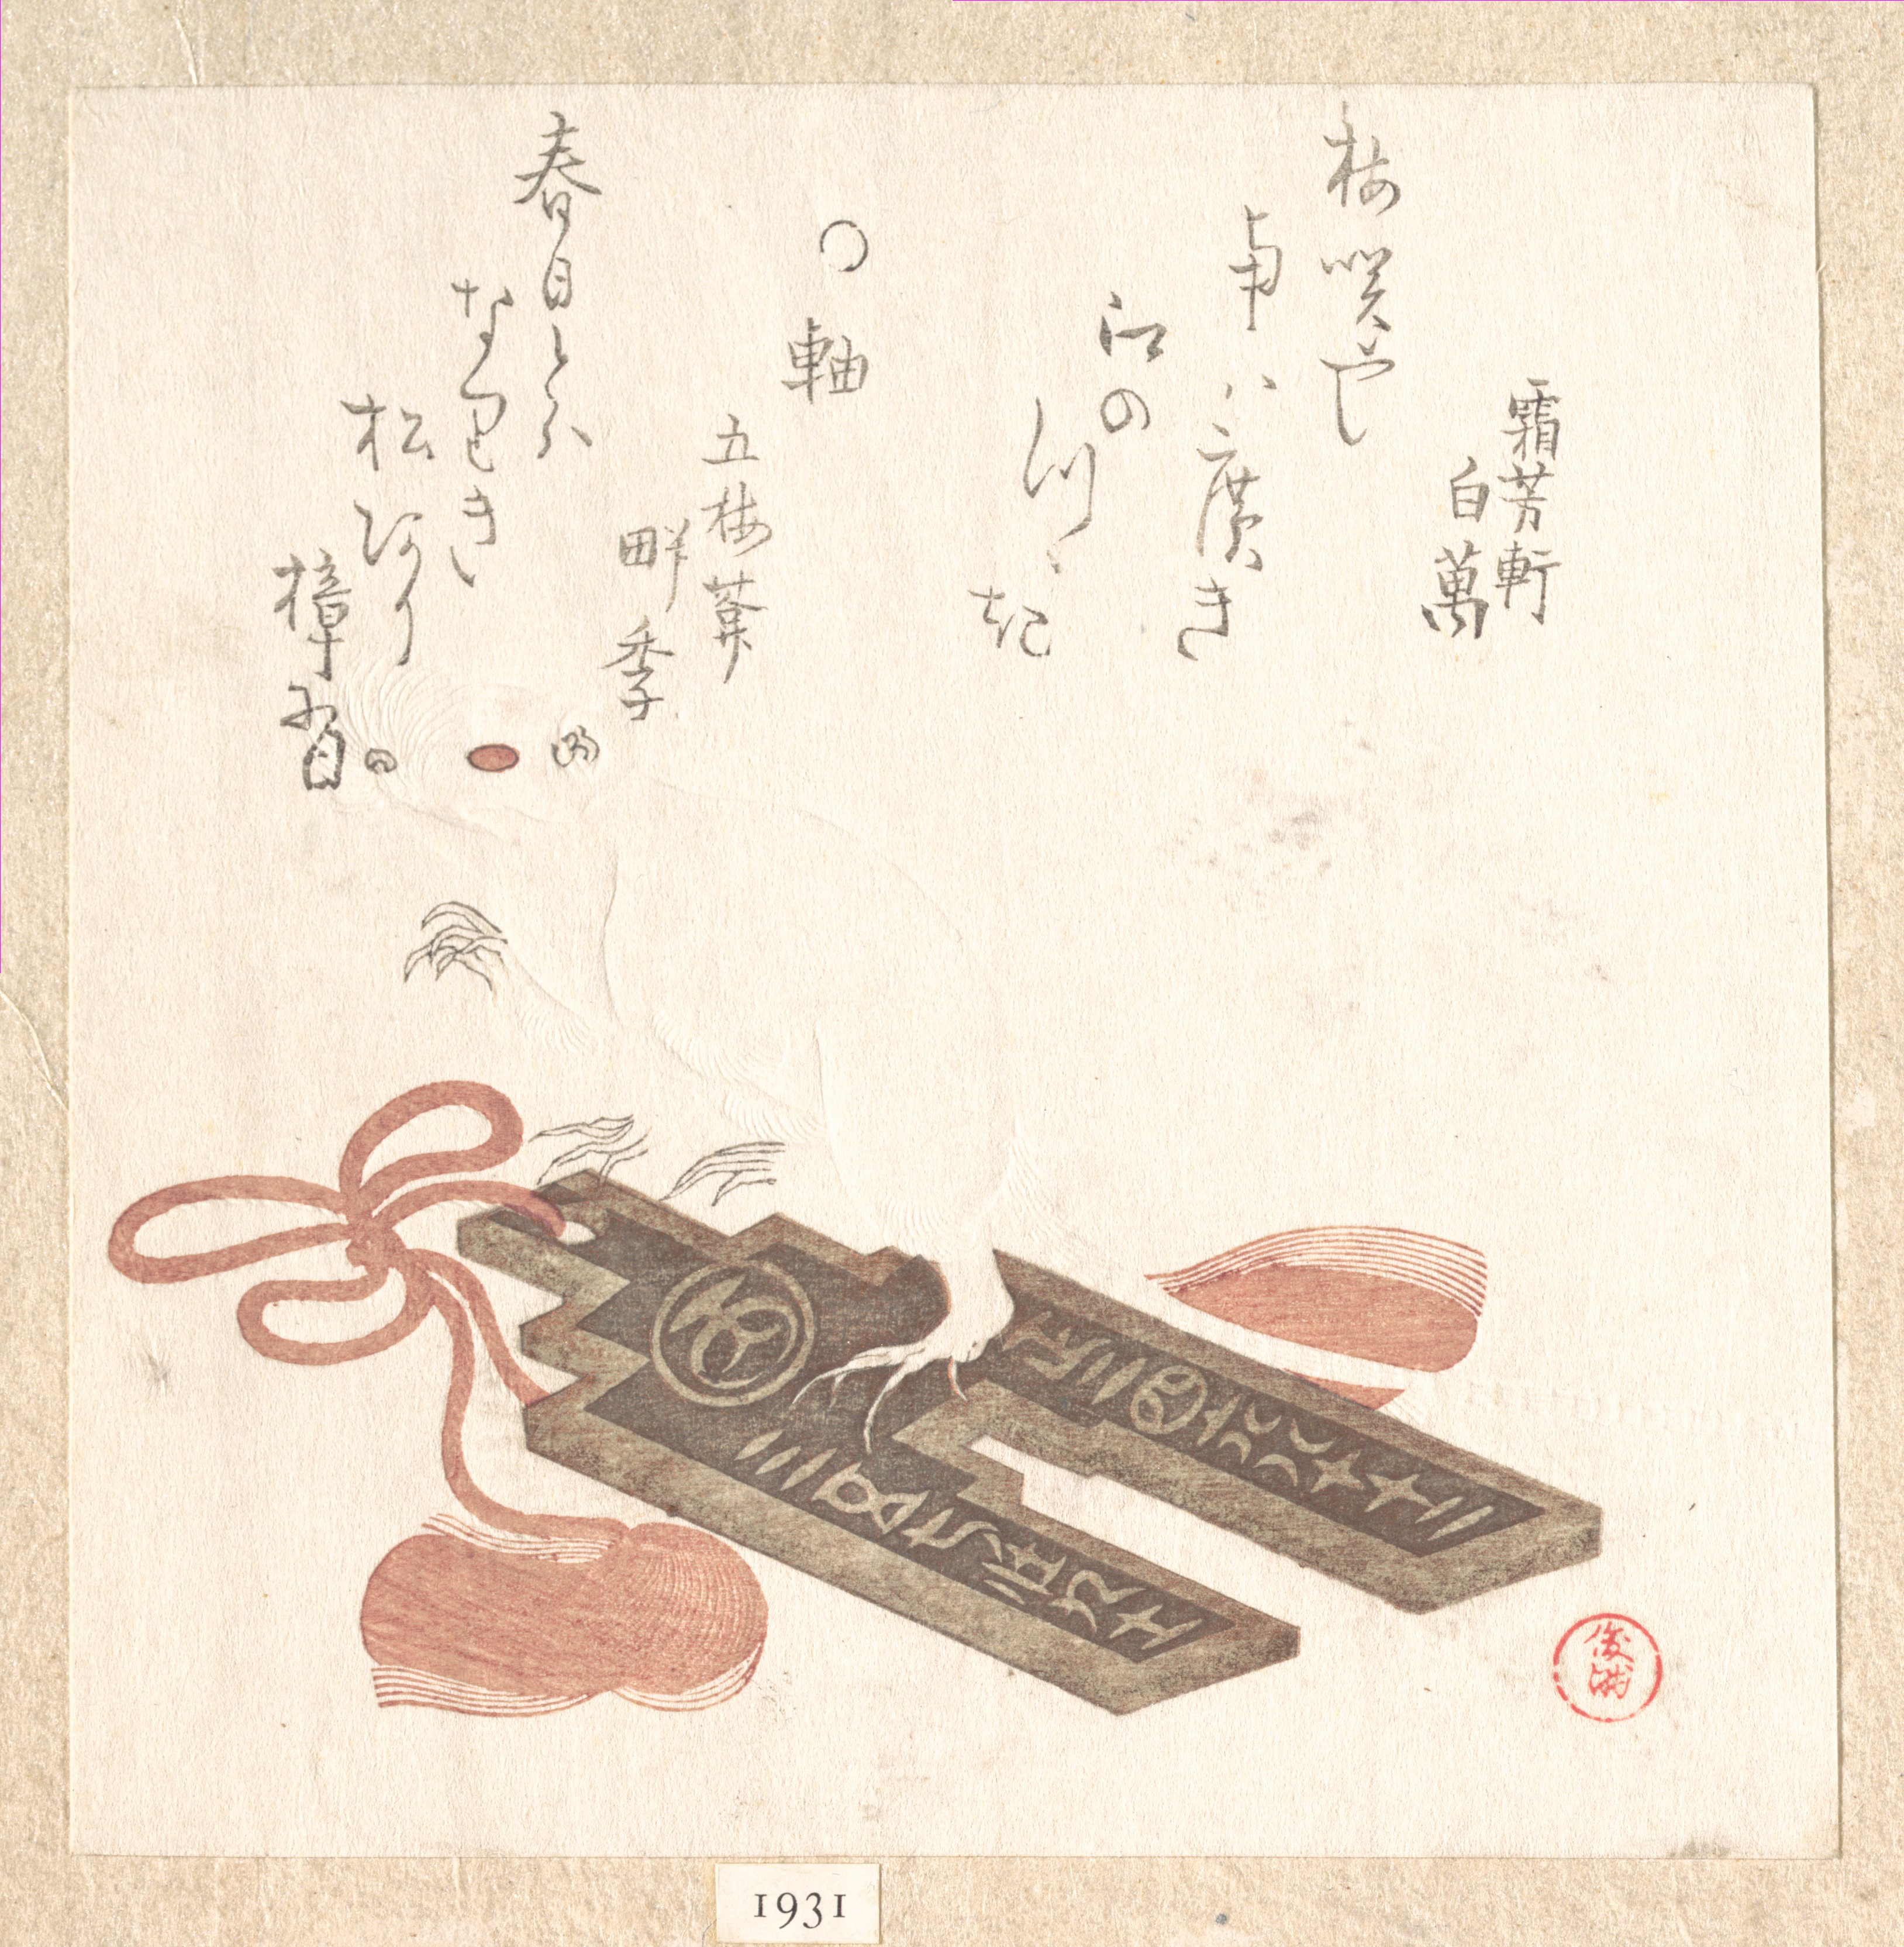 Rat on a Fuchin, Ornament with a Design of Egoyomi_ок.1816_141х140 мм